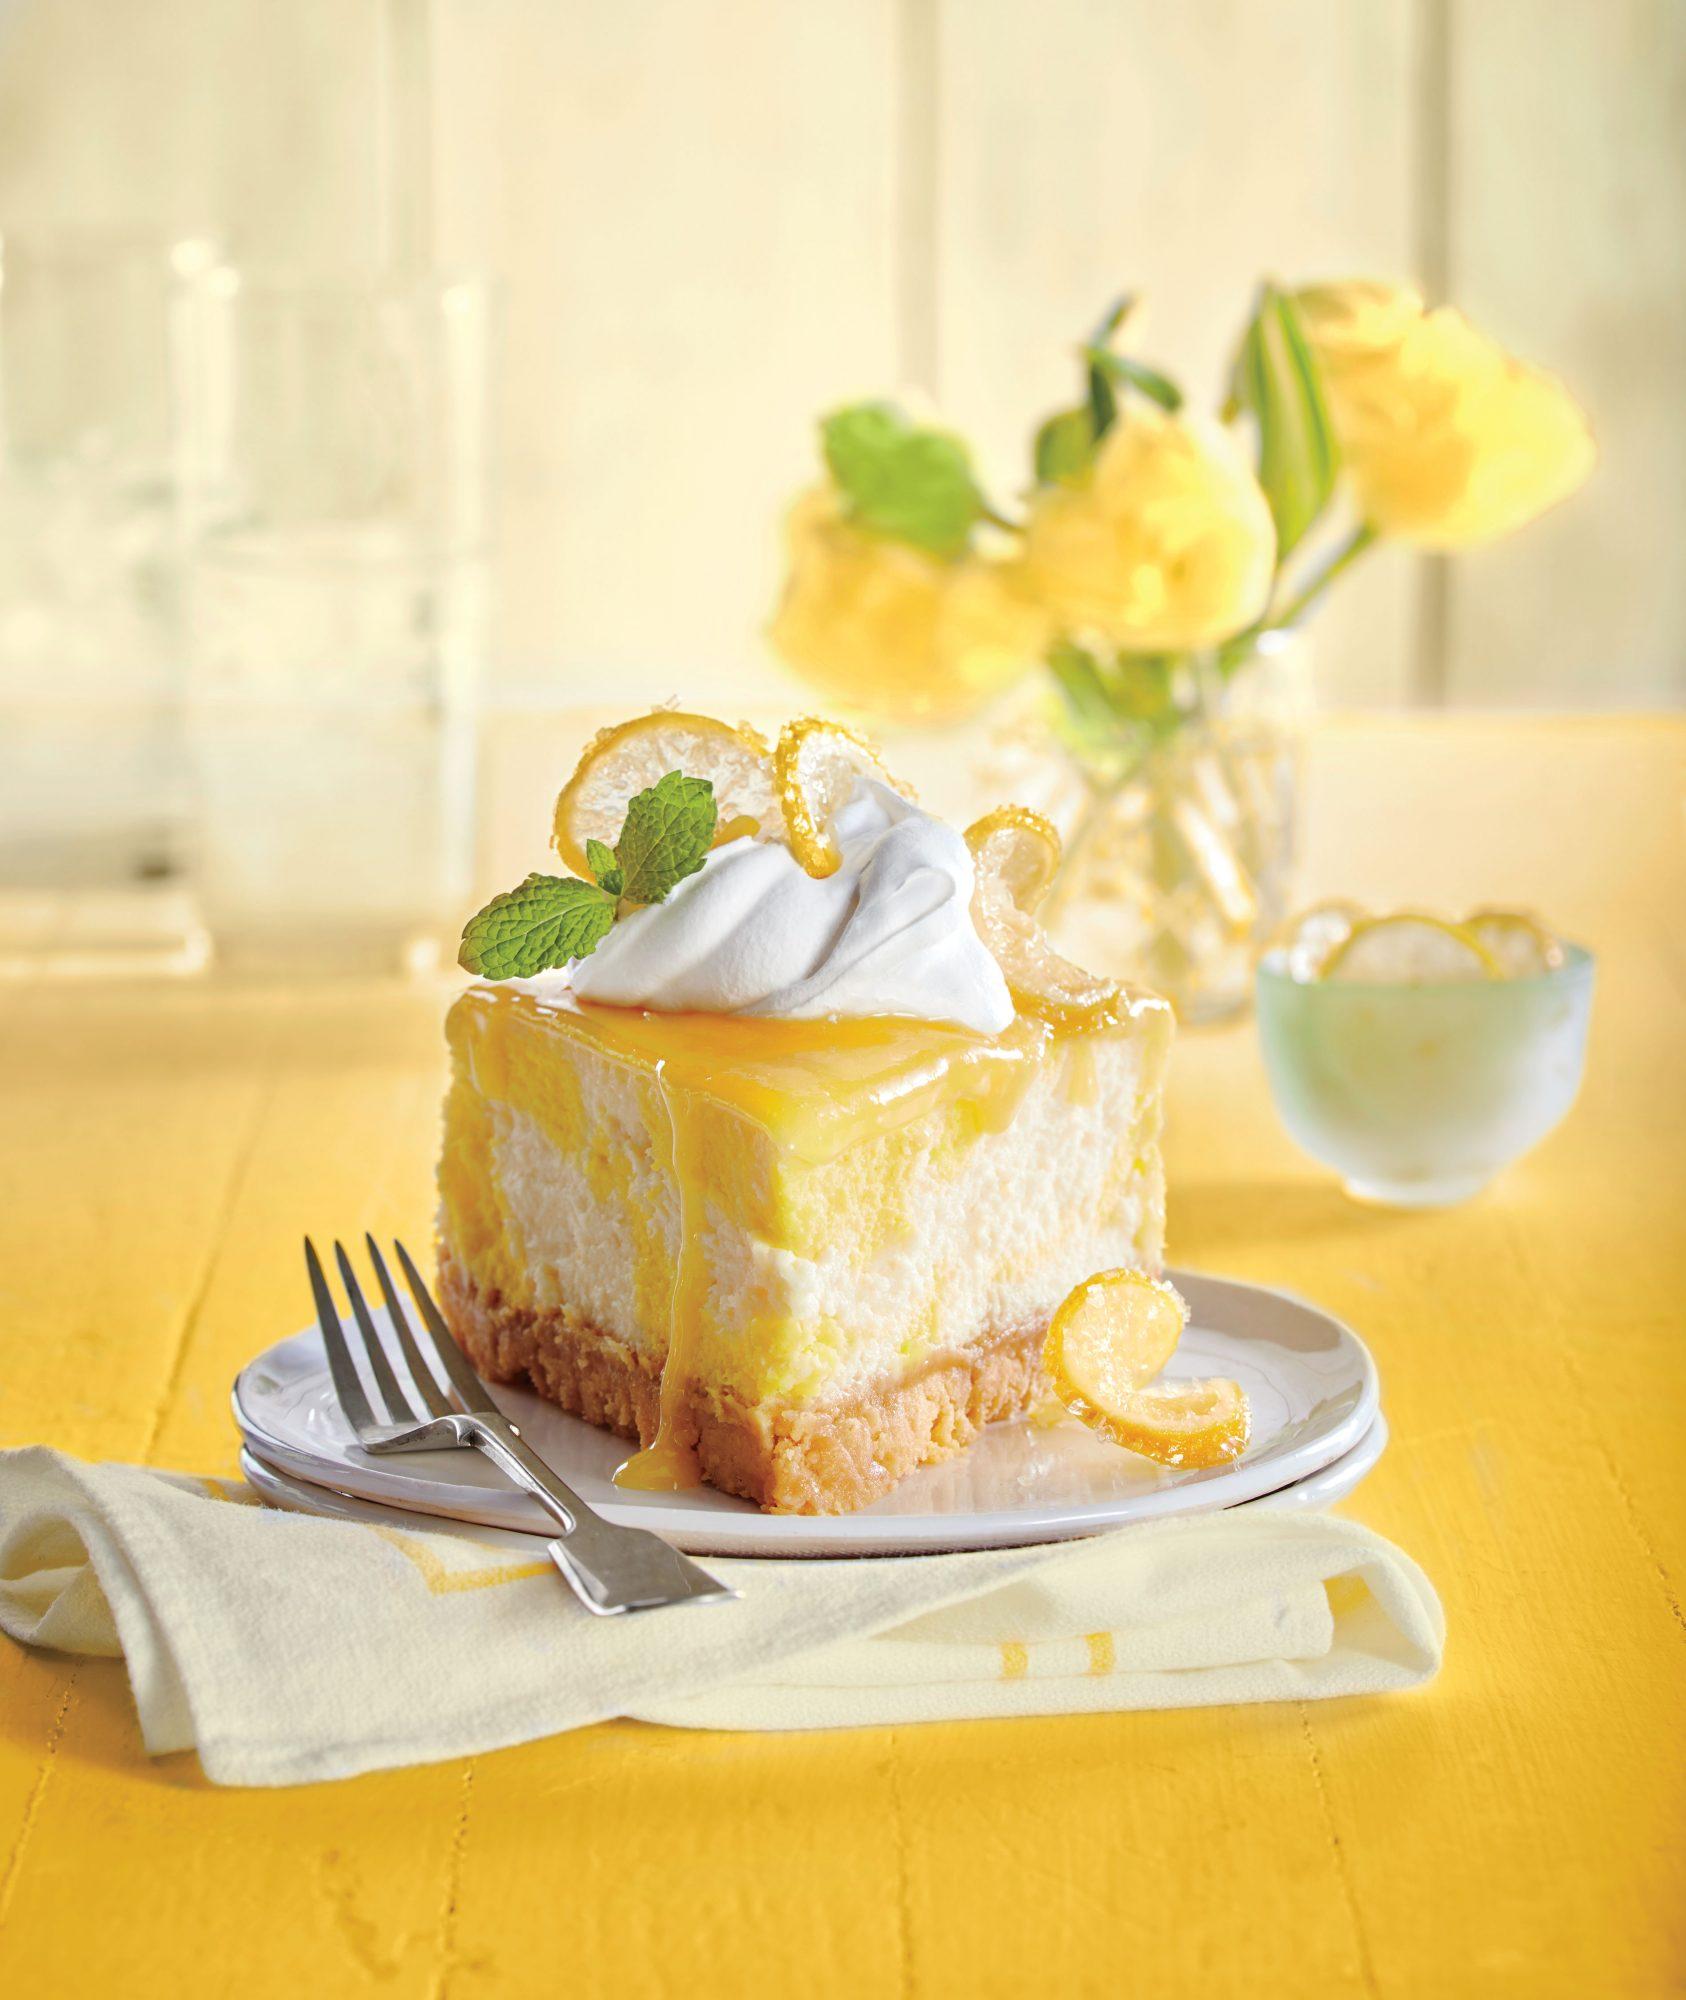 Dreamy Lemon Cheesecake image